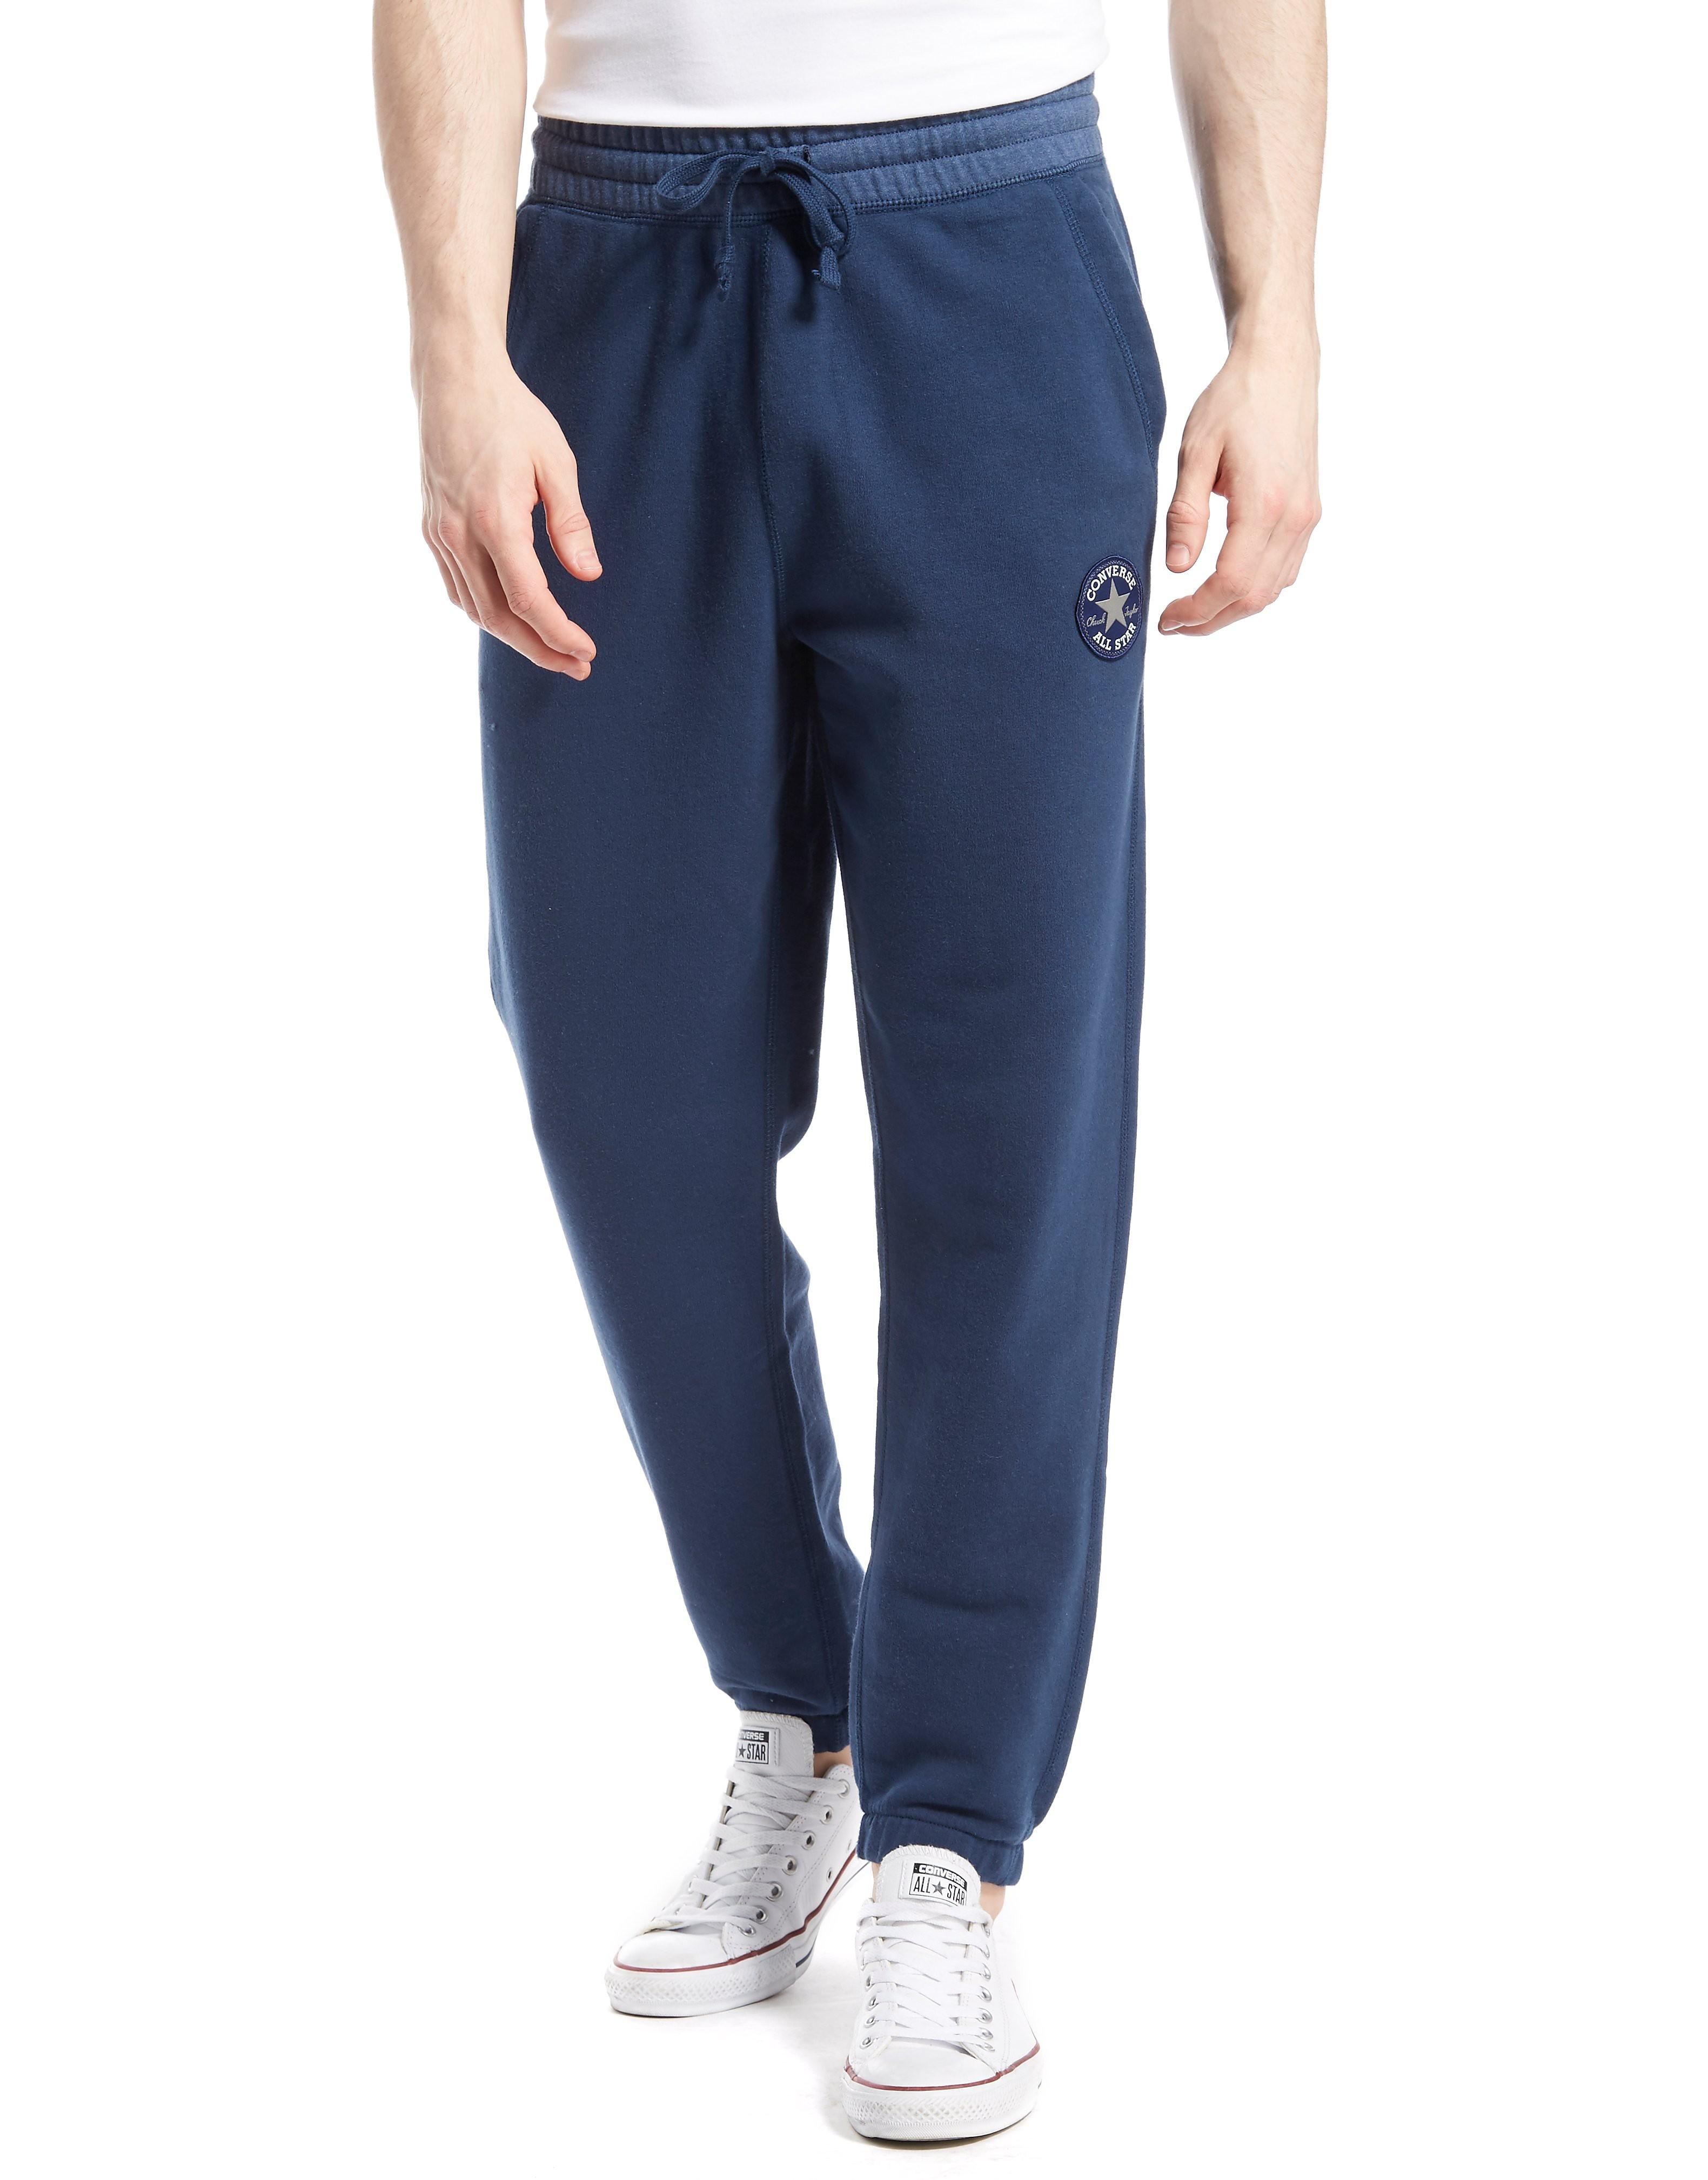 Converse Chuck Fleece Jogging Pants